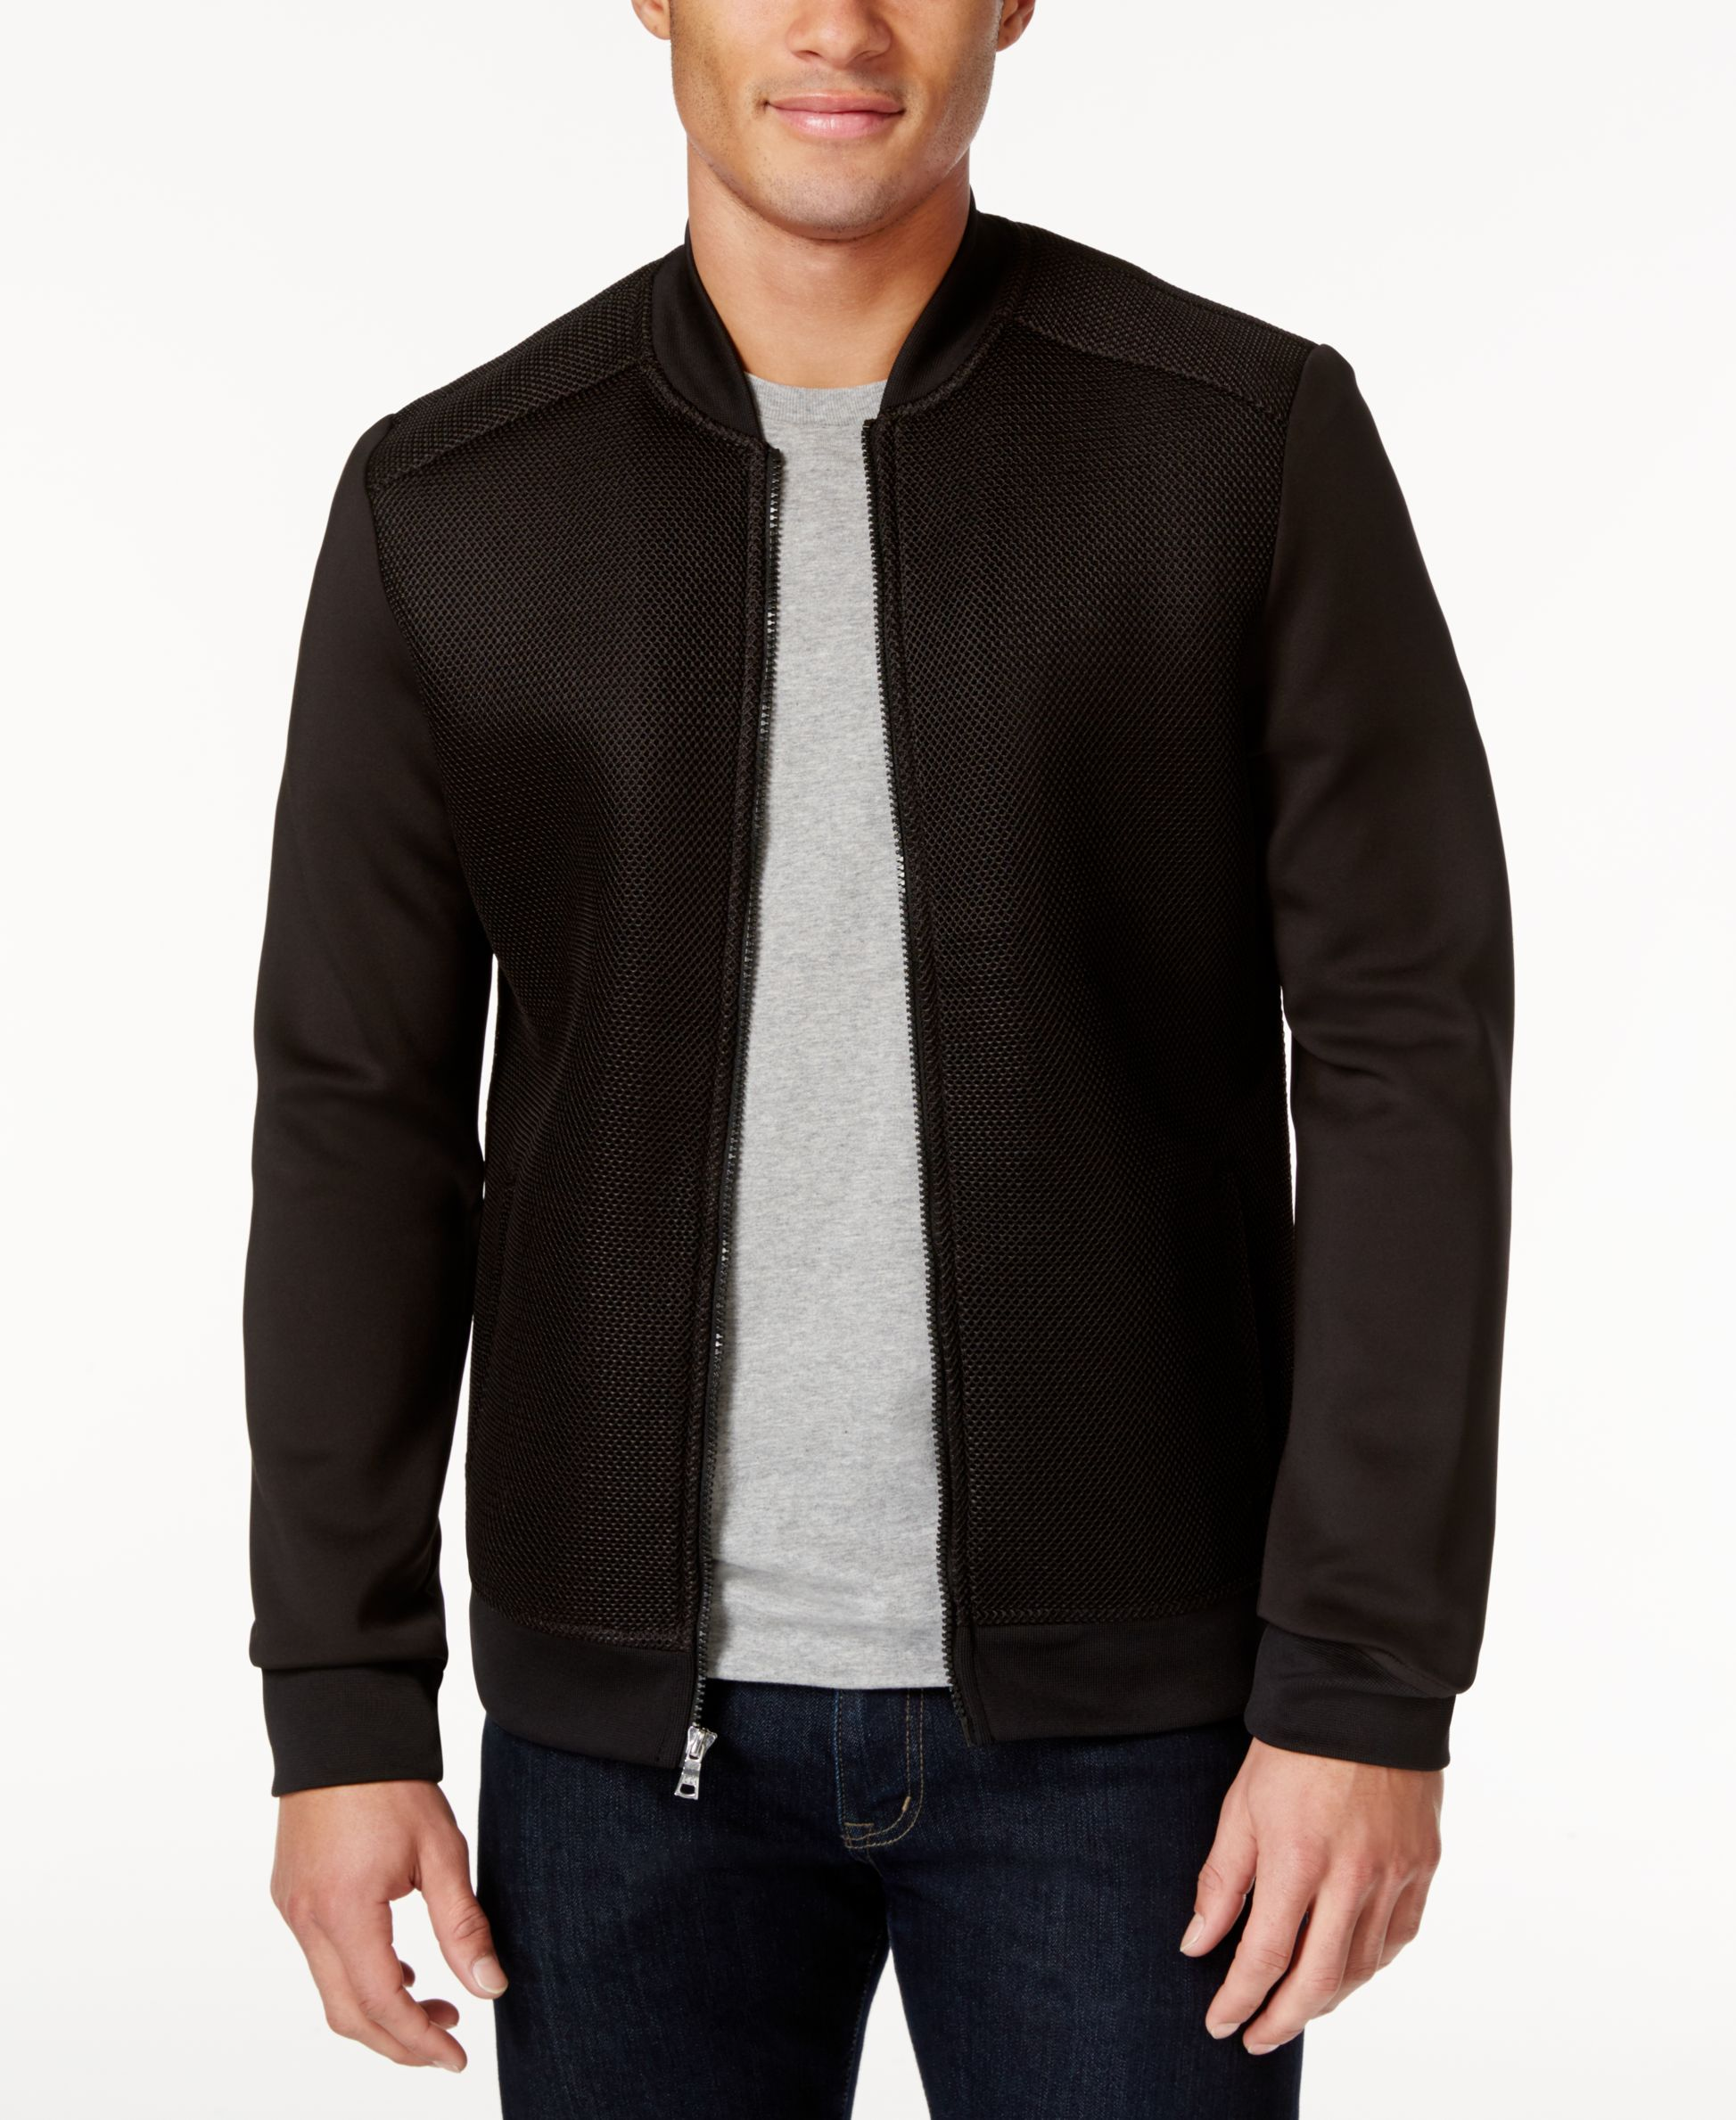 Inc International Concepts Men S Mesh Bomber Jacket Only At Macy S Coats Jackets Men Macy S In 2021 Mens Jackets Bomber Jacket Men Sweater [ 2378 x 1947 Pixel ]